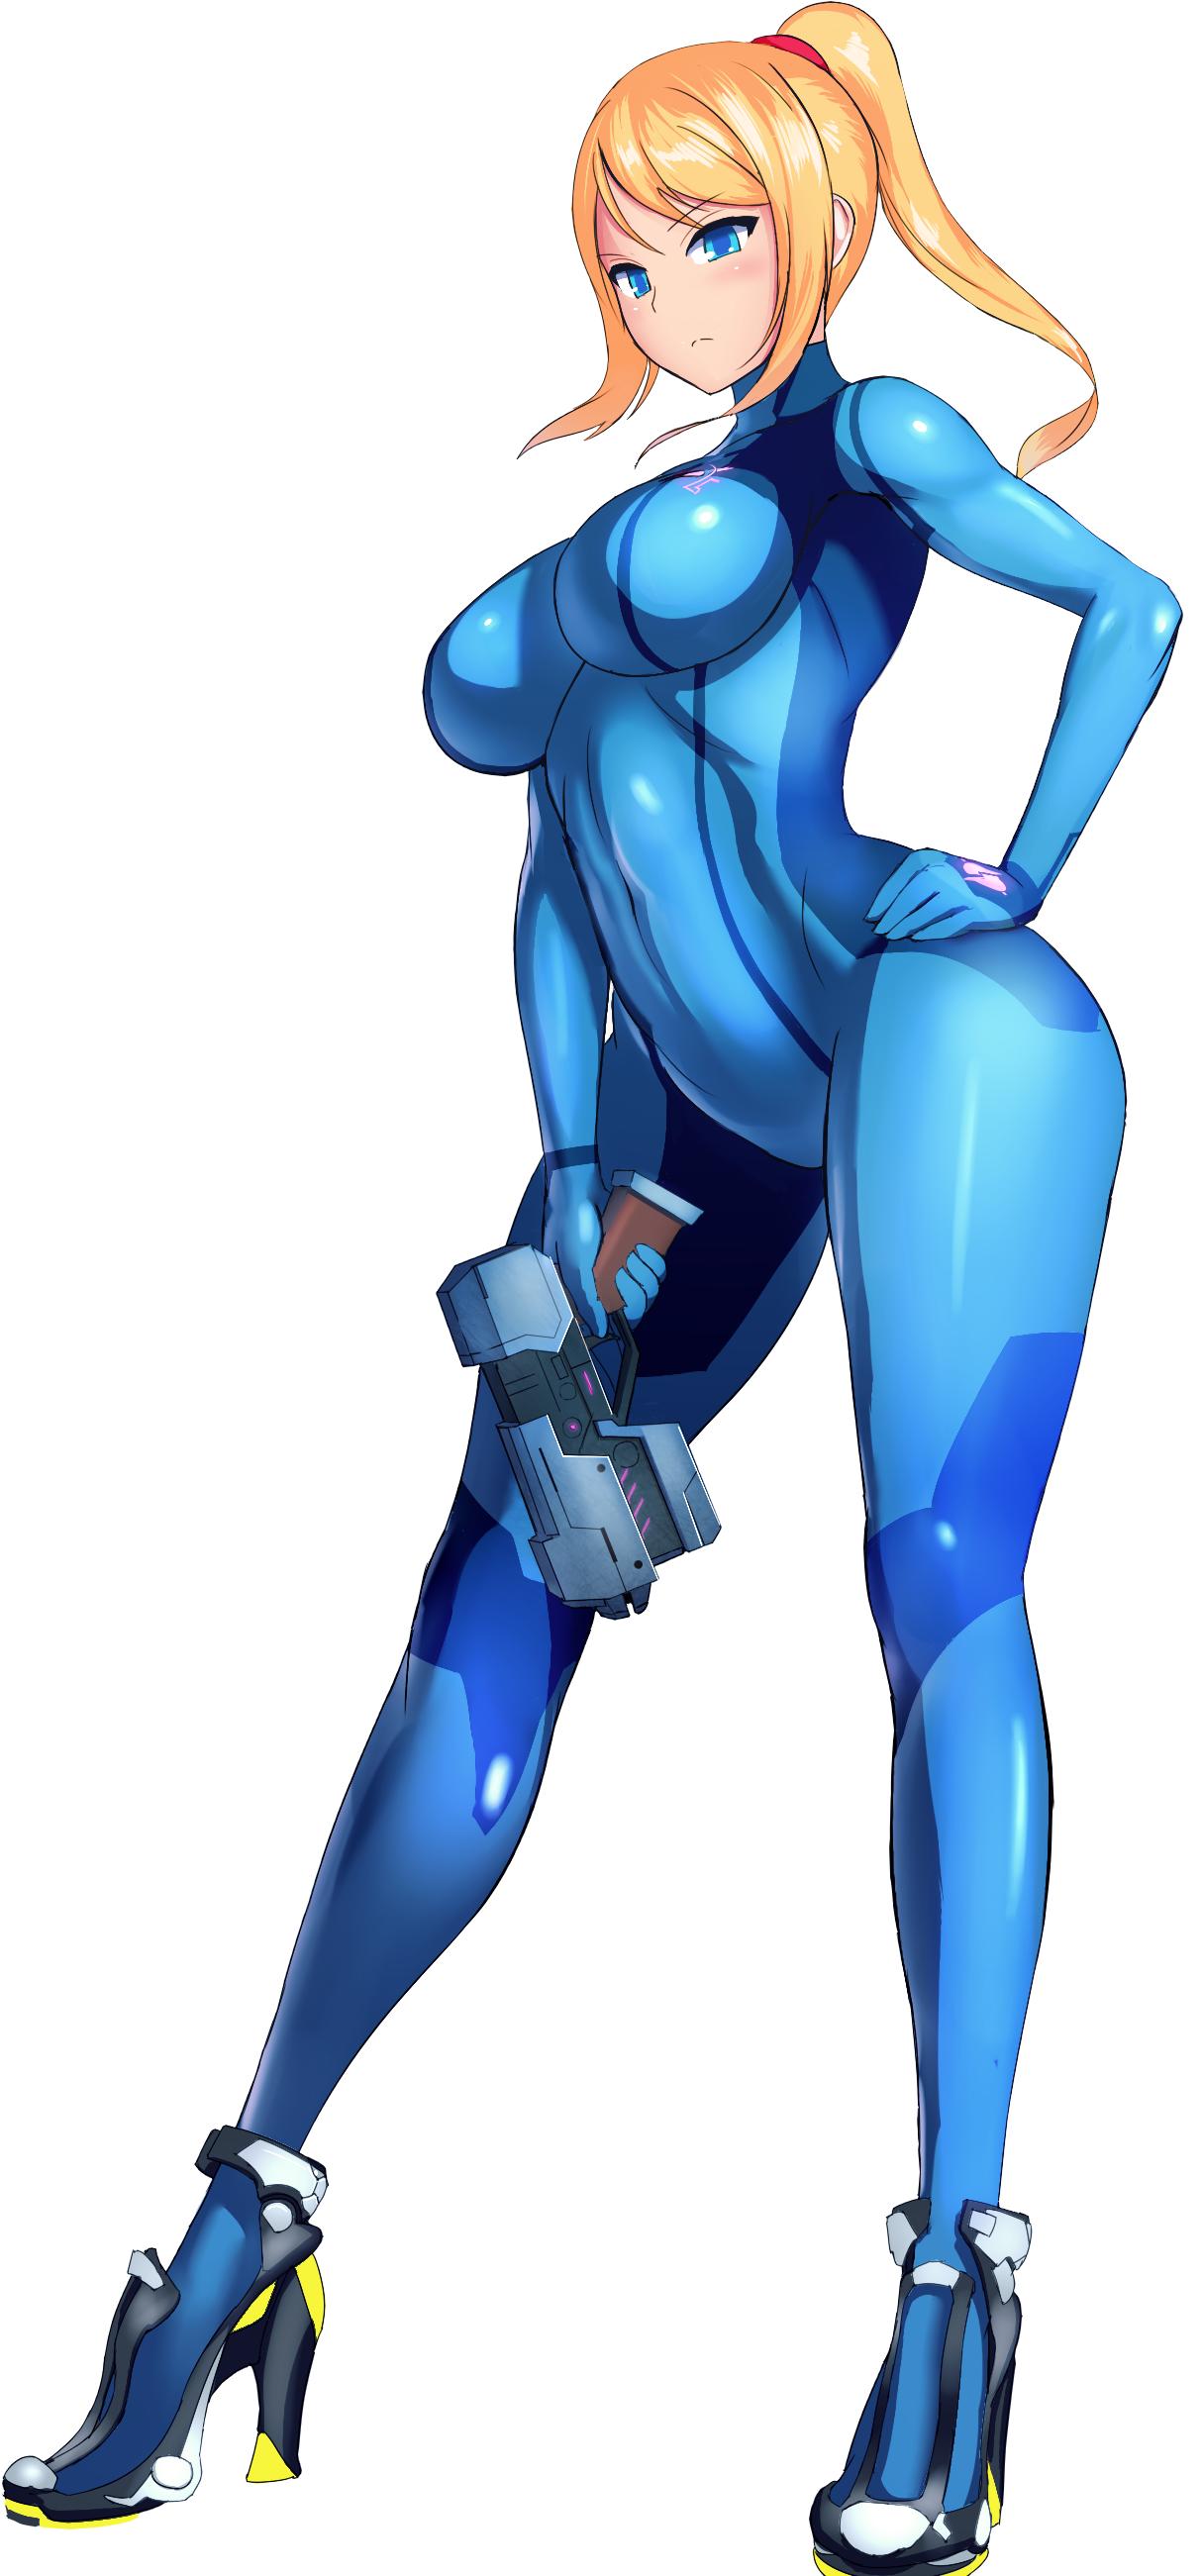 Samus Aran Zero Suit Metroid Series Artwork By Booster